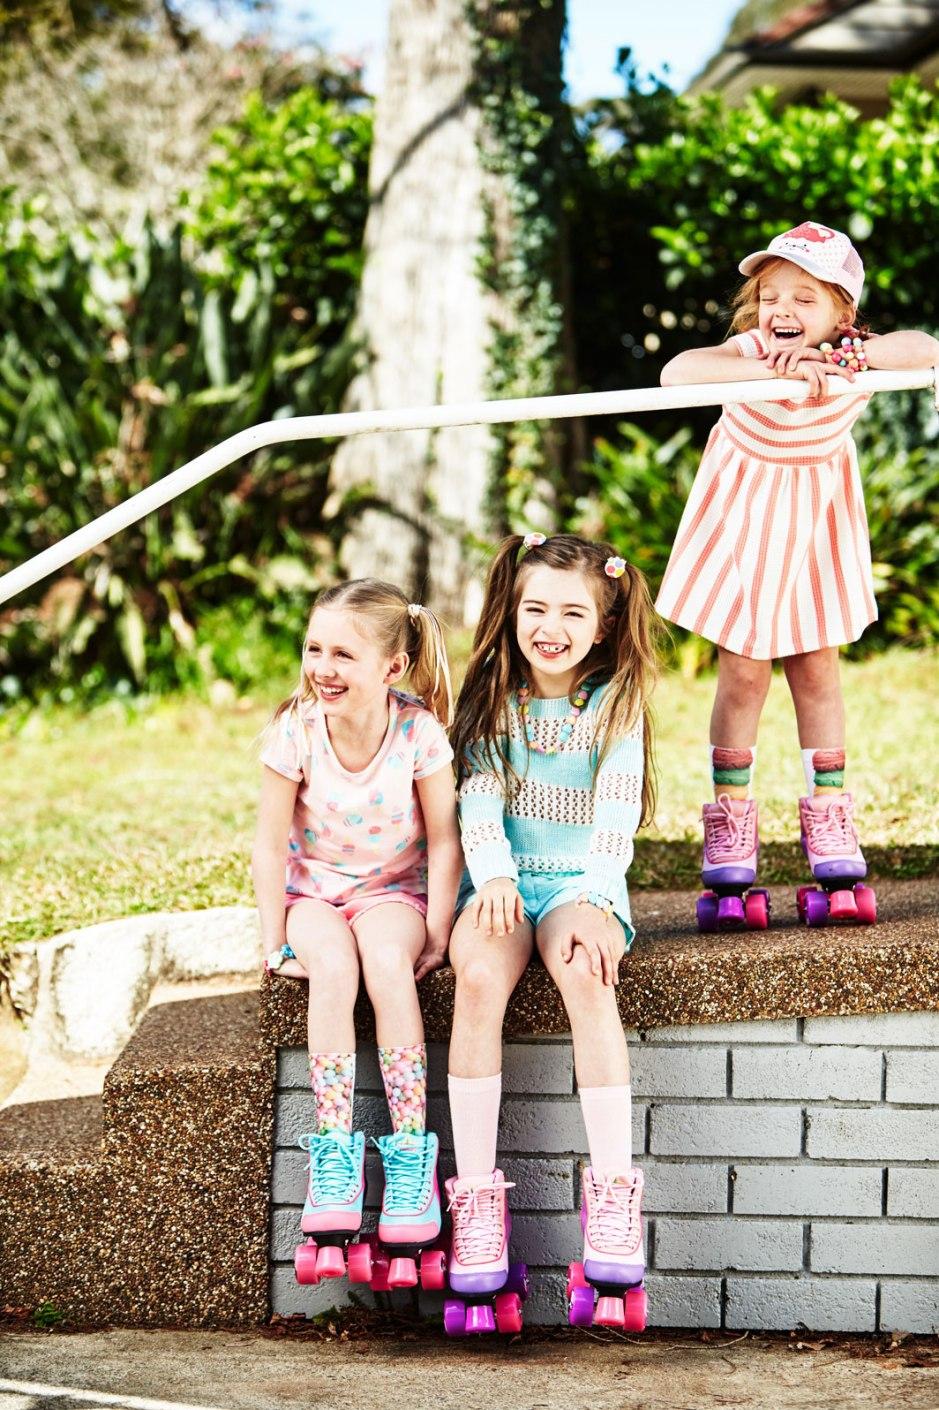 See the Skates + Socks Birthday Party on childmagsblog.com